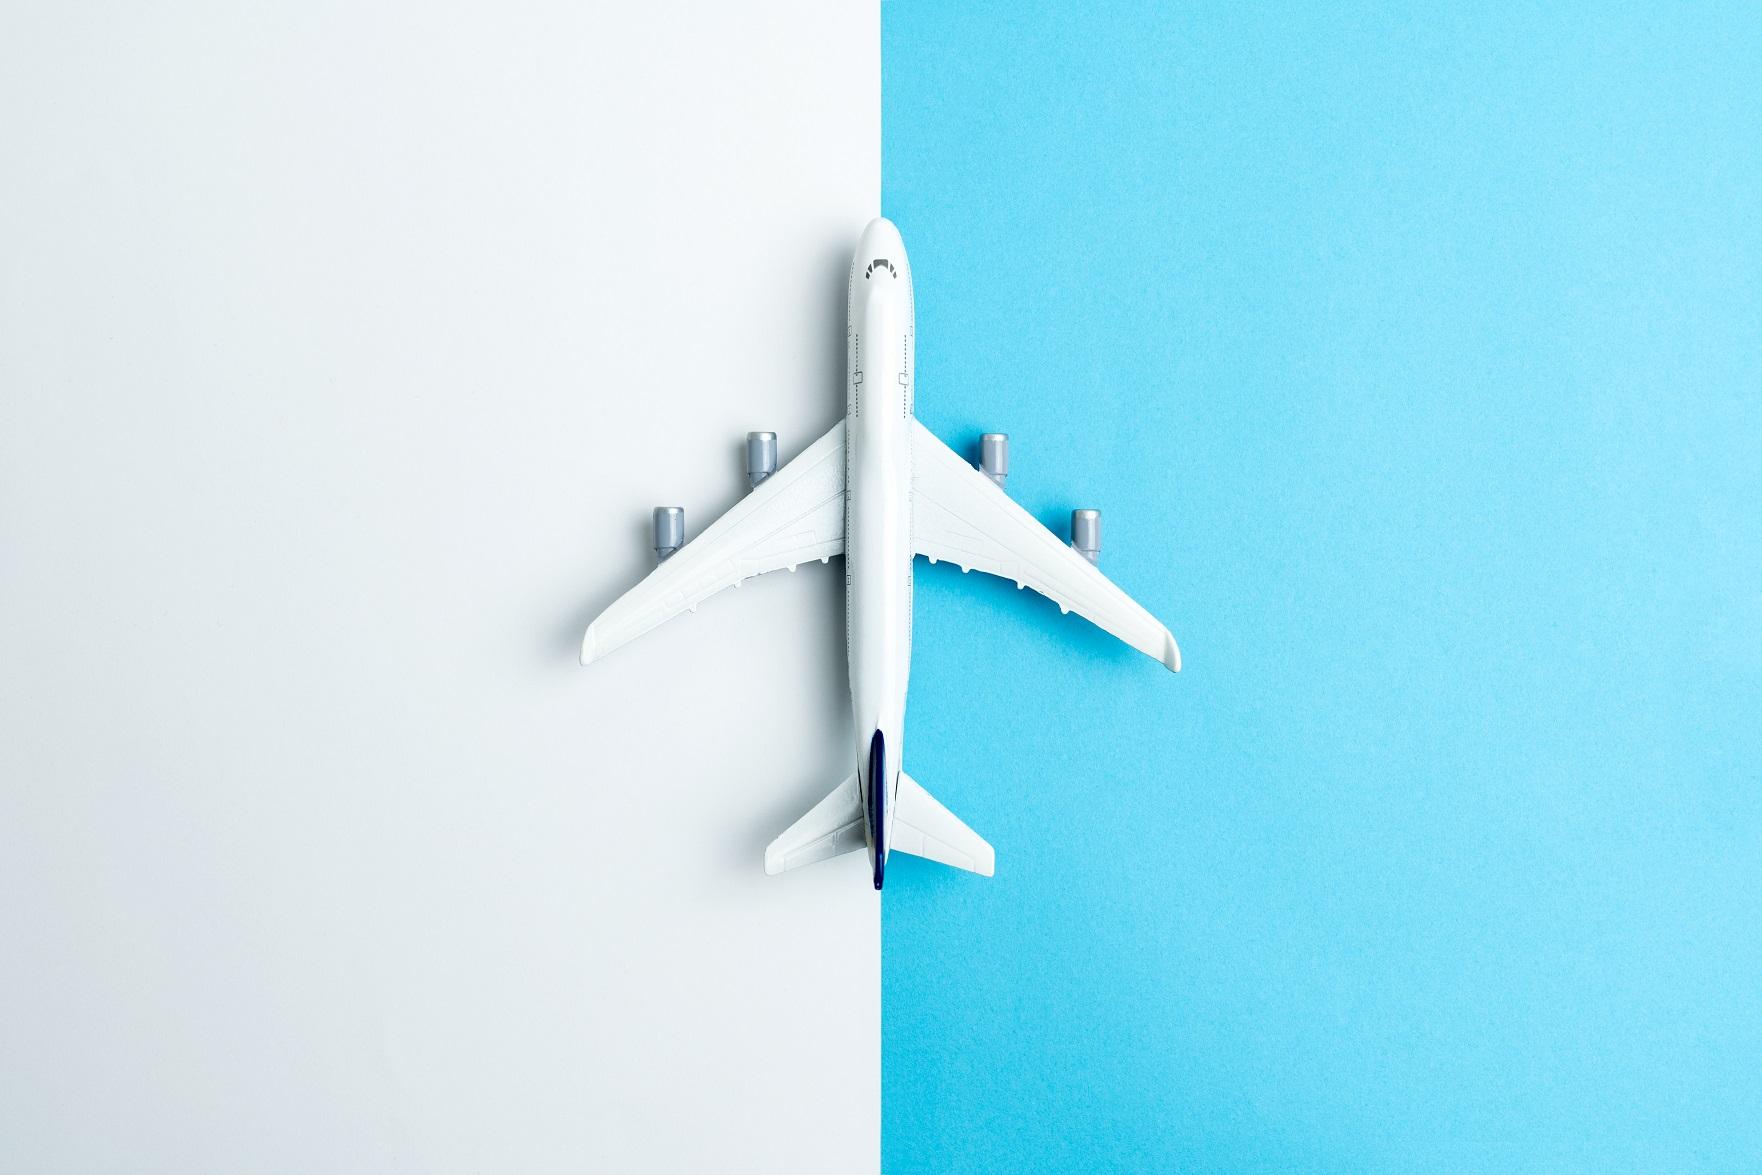 flat lay airplane model NHB2HXW #экономика Covid-19, авиасообщение, Агентство гражданской авиации, Георгий Джахуташвили, Грузия-Казахстан, инвестиции, коронавирус, коронавирус в Грузии, Леван Карнадзе